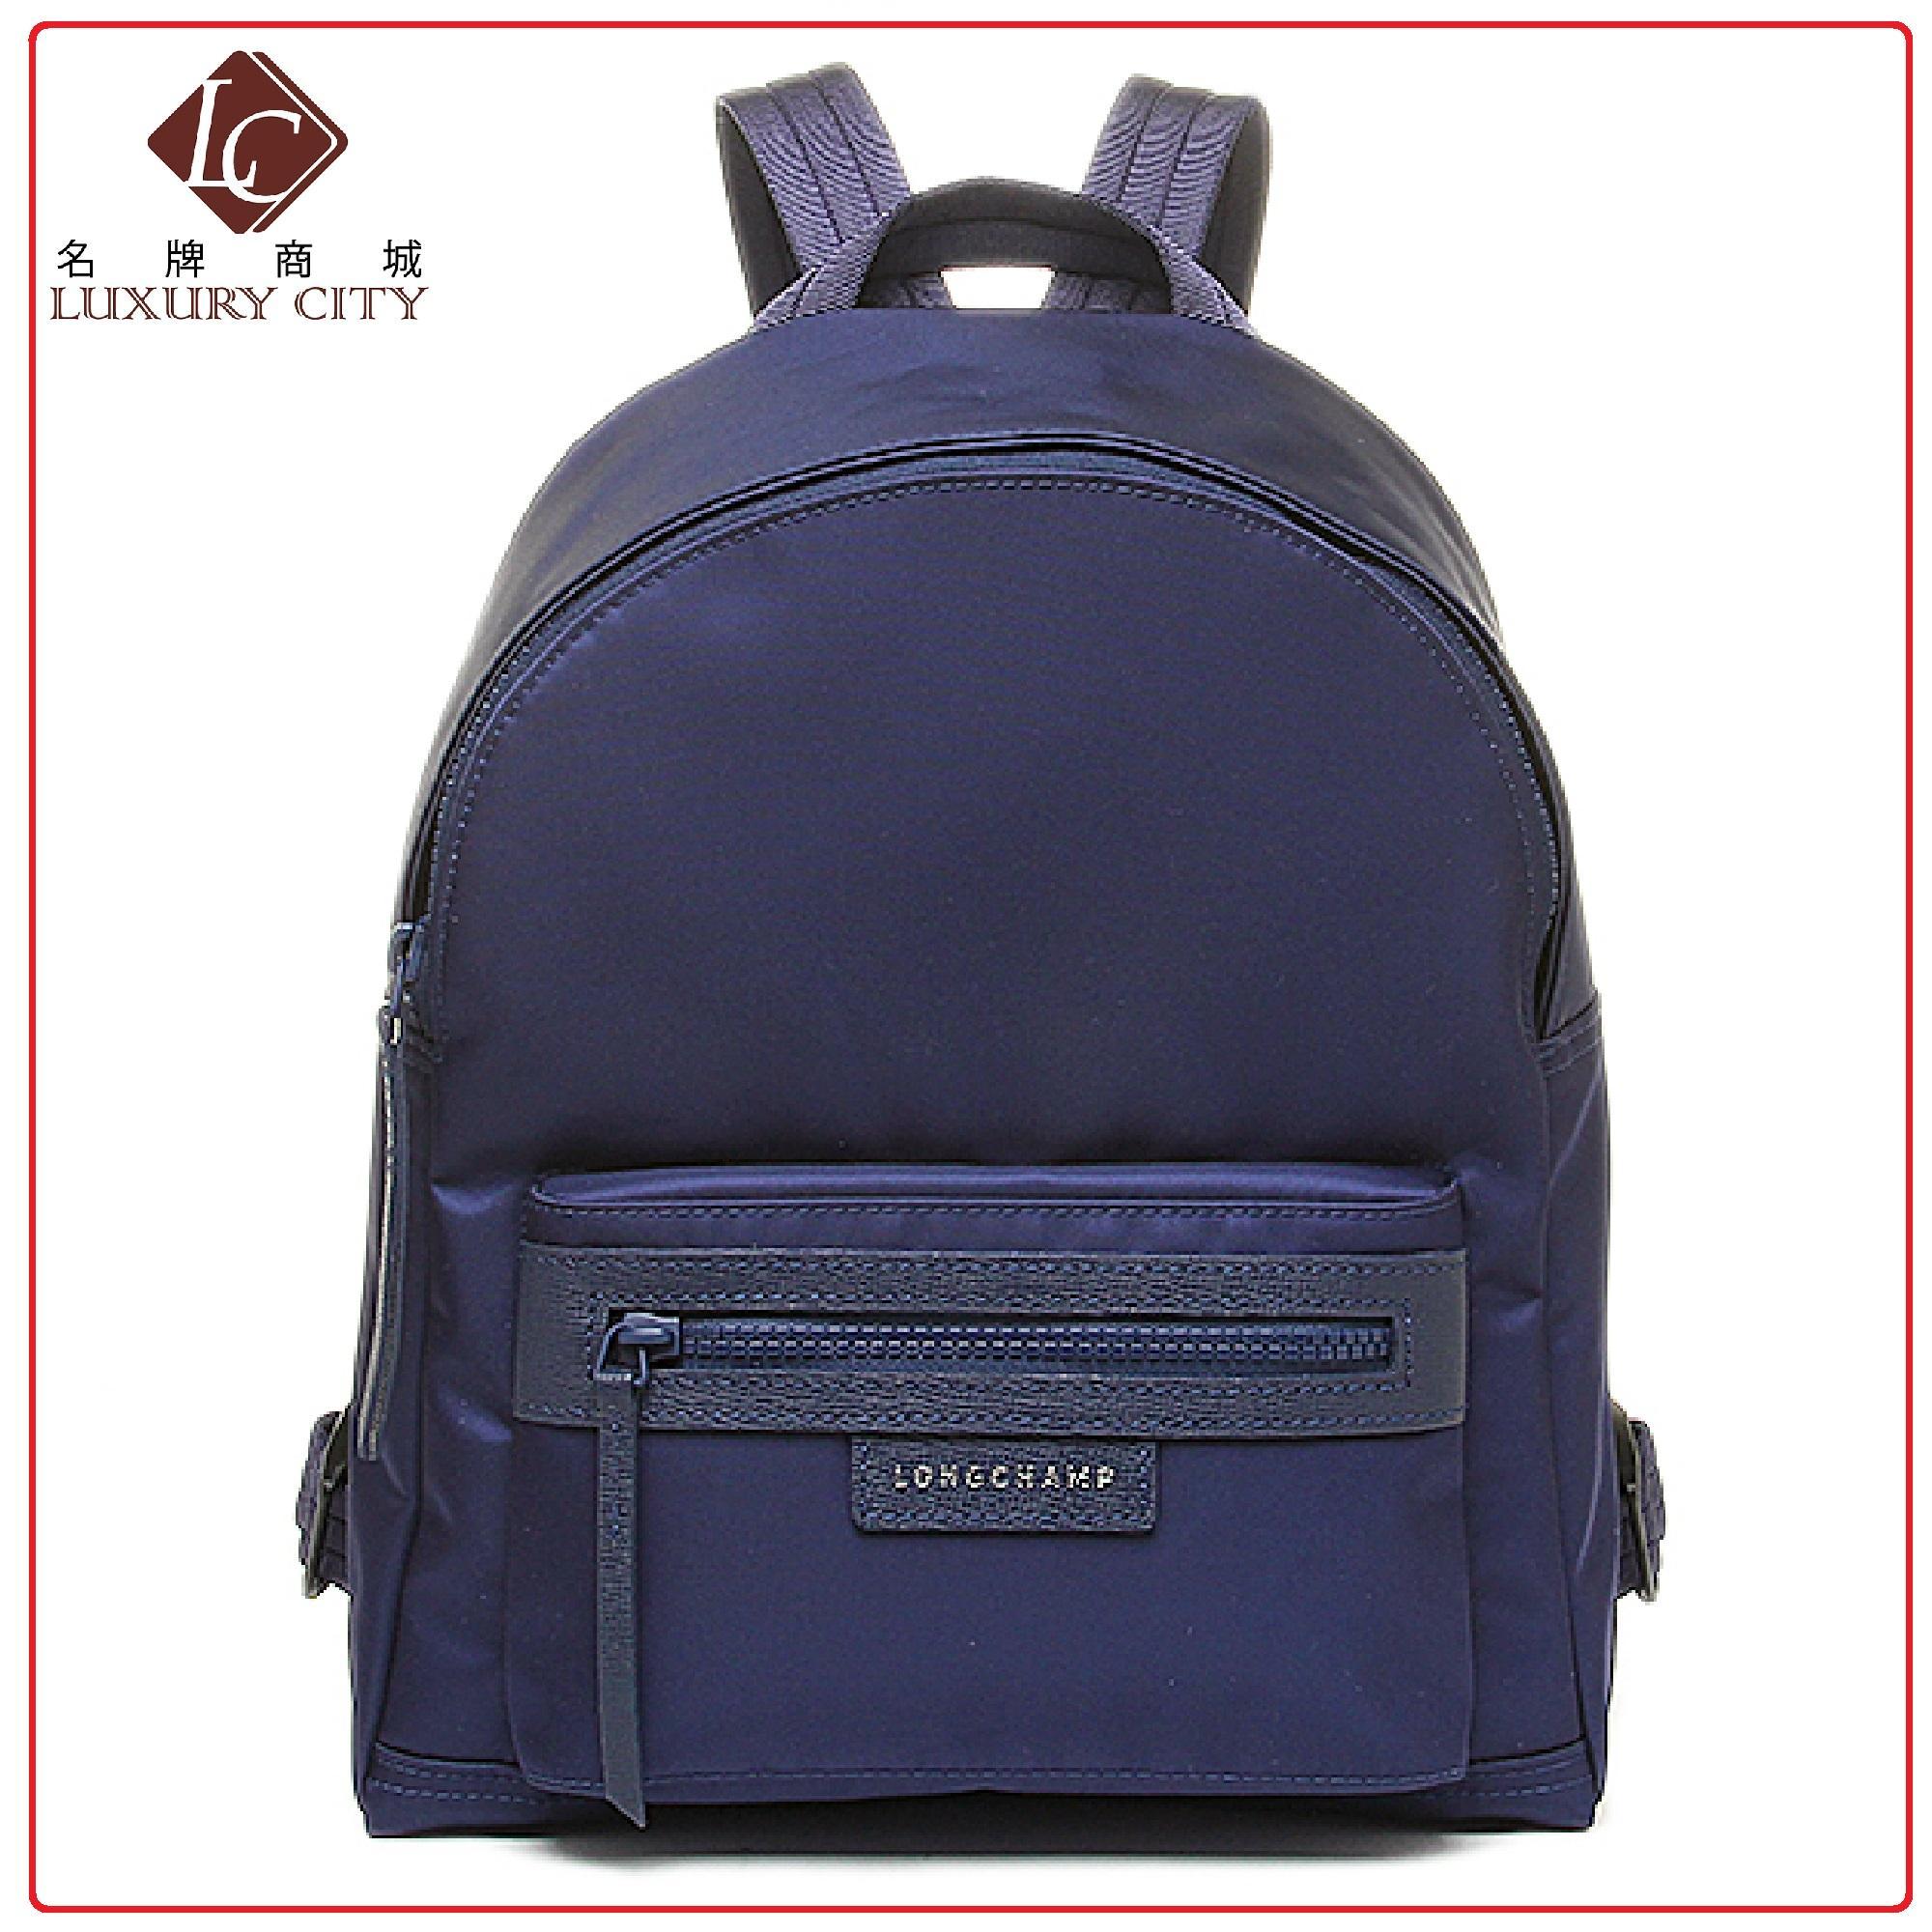 eac9339da210 Longchamp Le Pliage Travel Bag Singapore